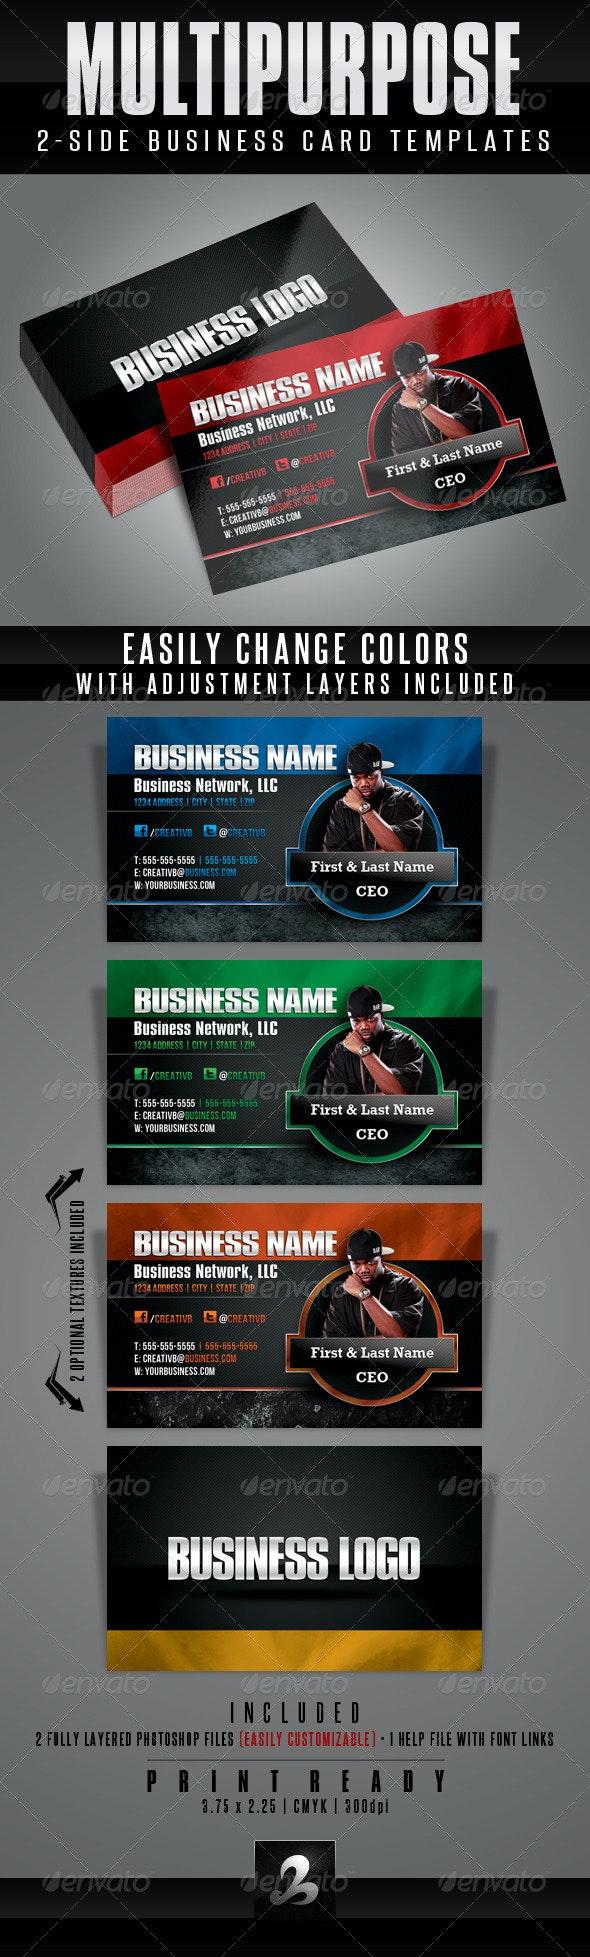 Multipurpose Business Card Templates 1 - Corporate Business Cards